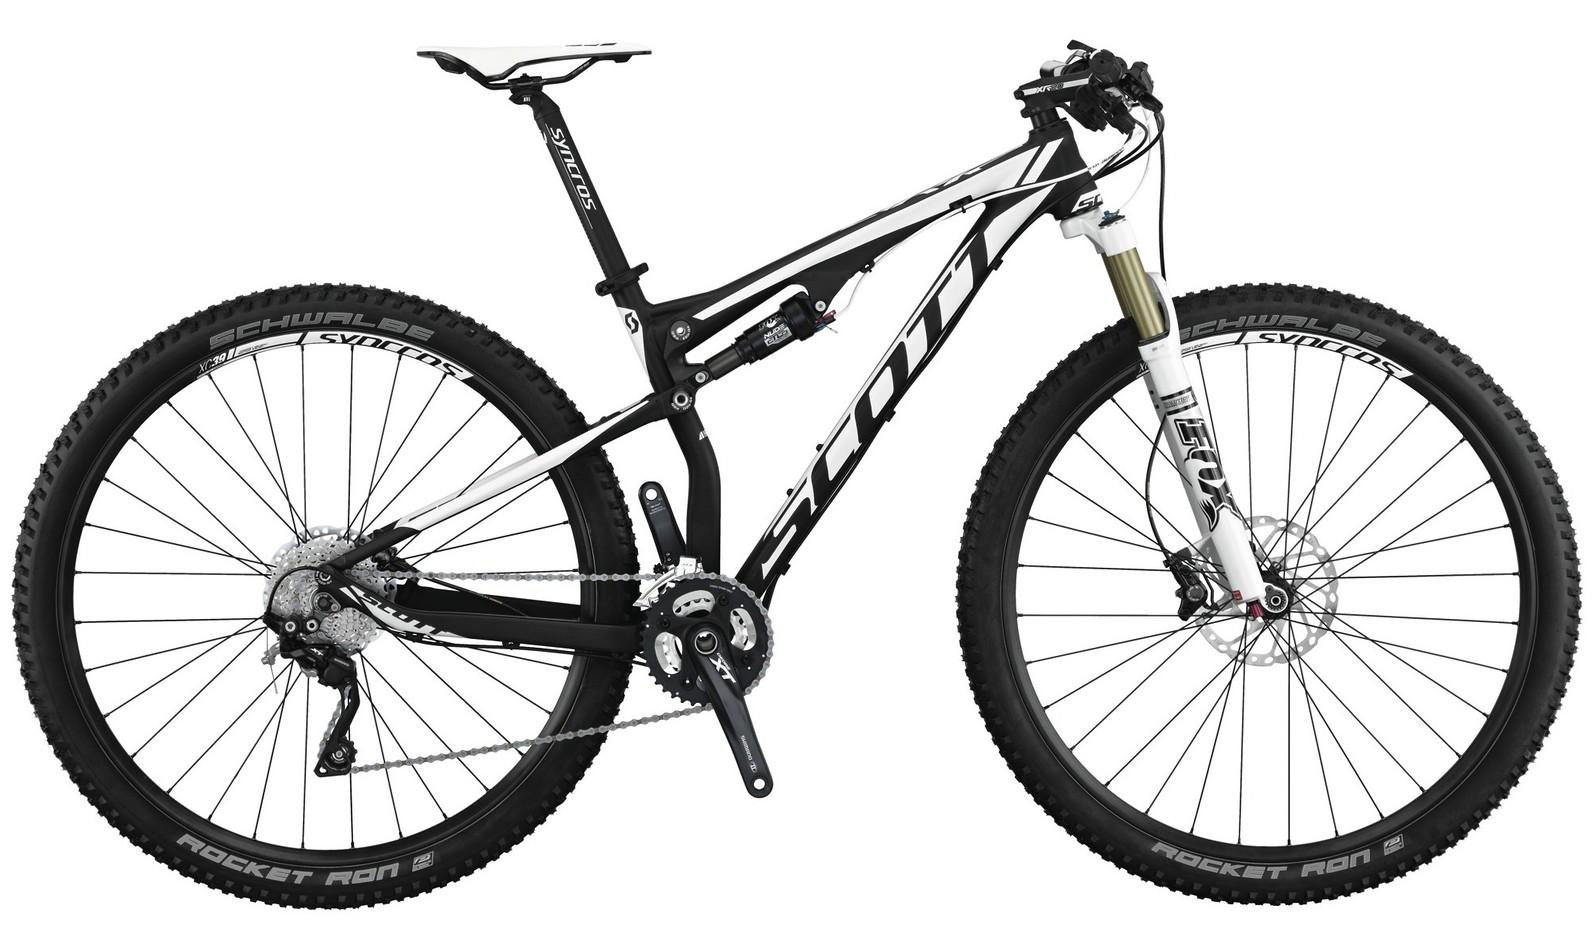 Continental Bicycle Tires >> 2015 Scott Spark 940 Bike - Reviews, Comparisons, Specs ...